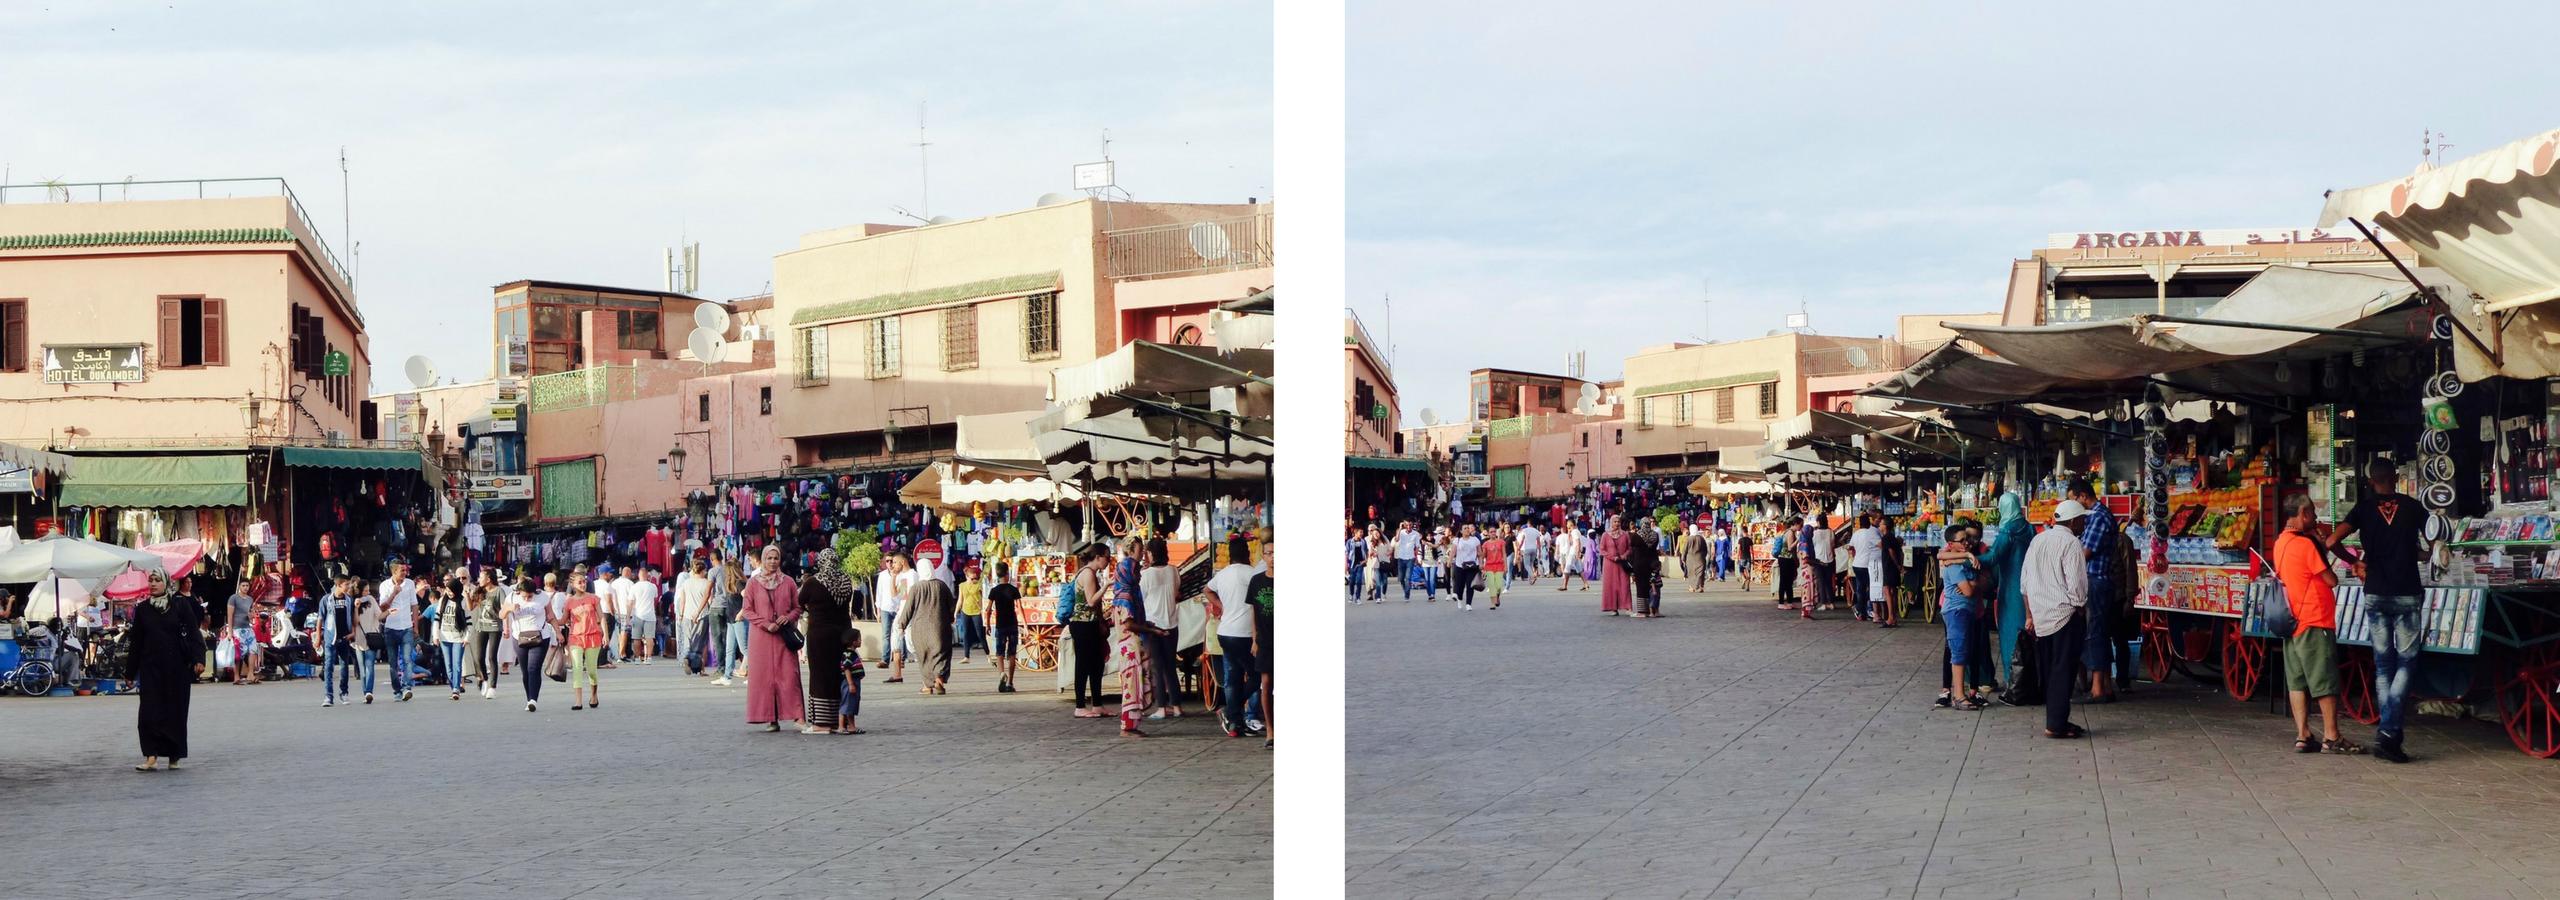 Blog voyage Marrakech